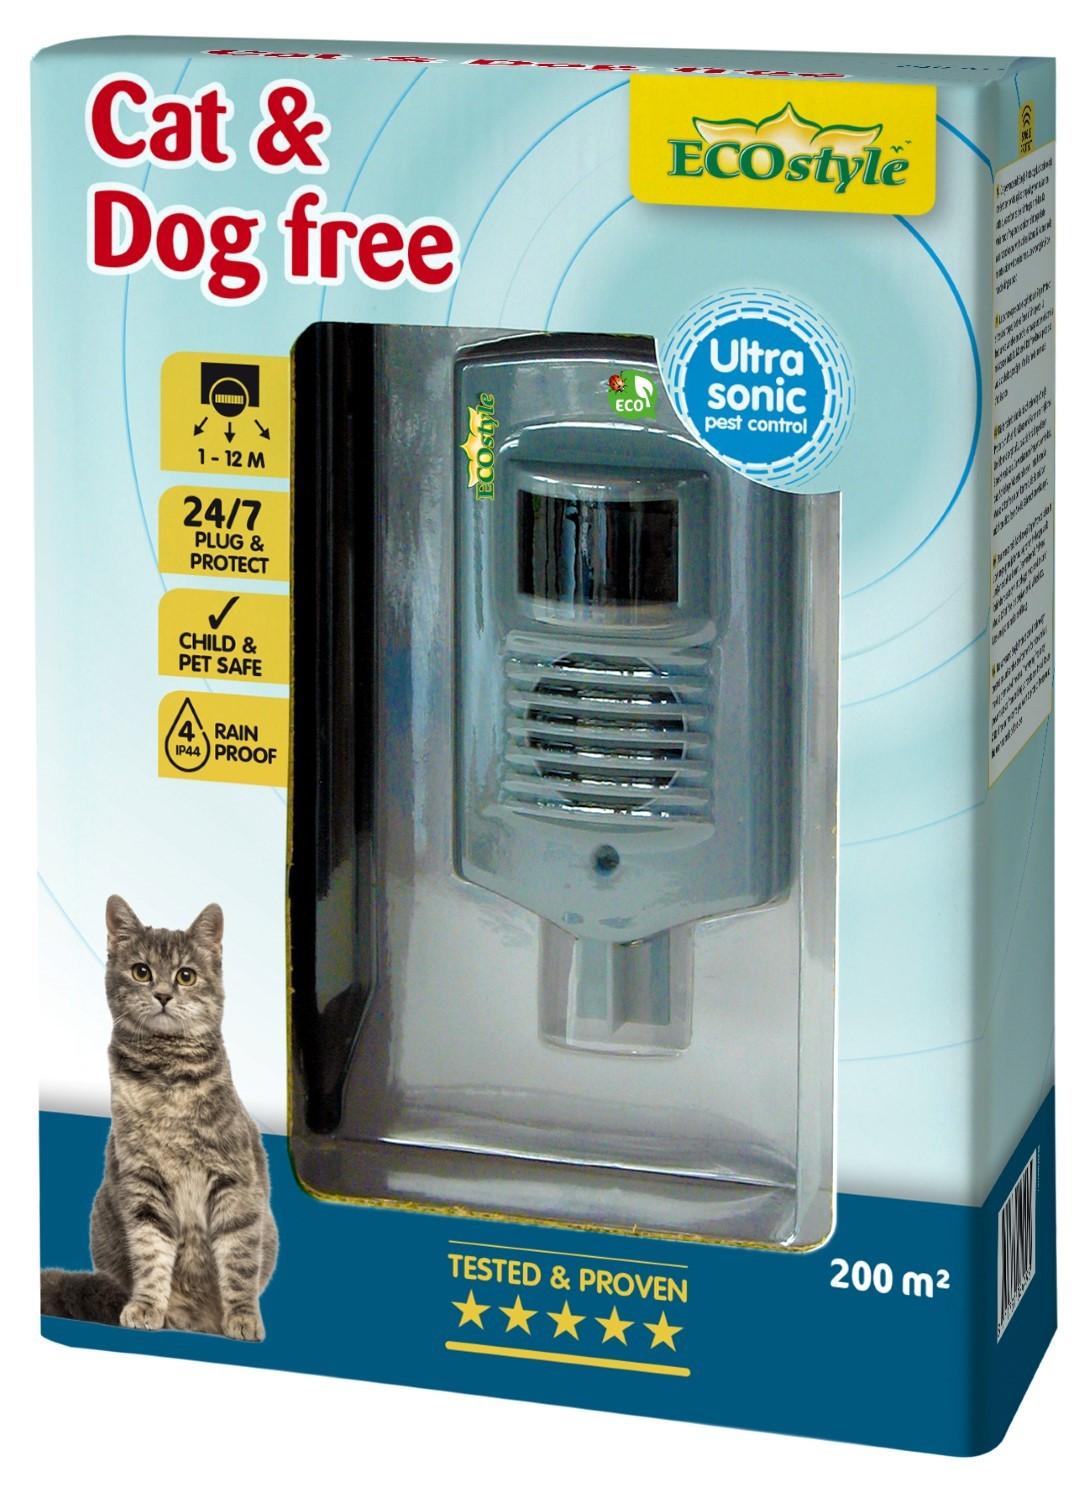 Cat & Dog free 200 m2